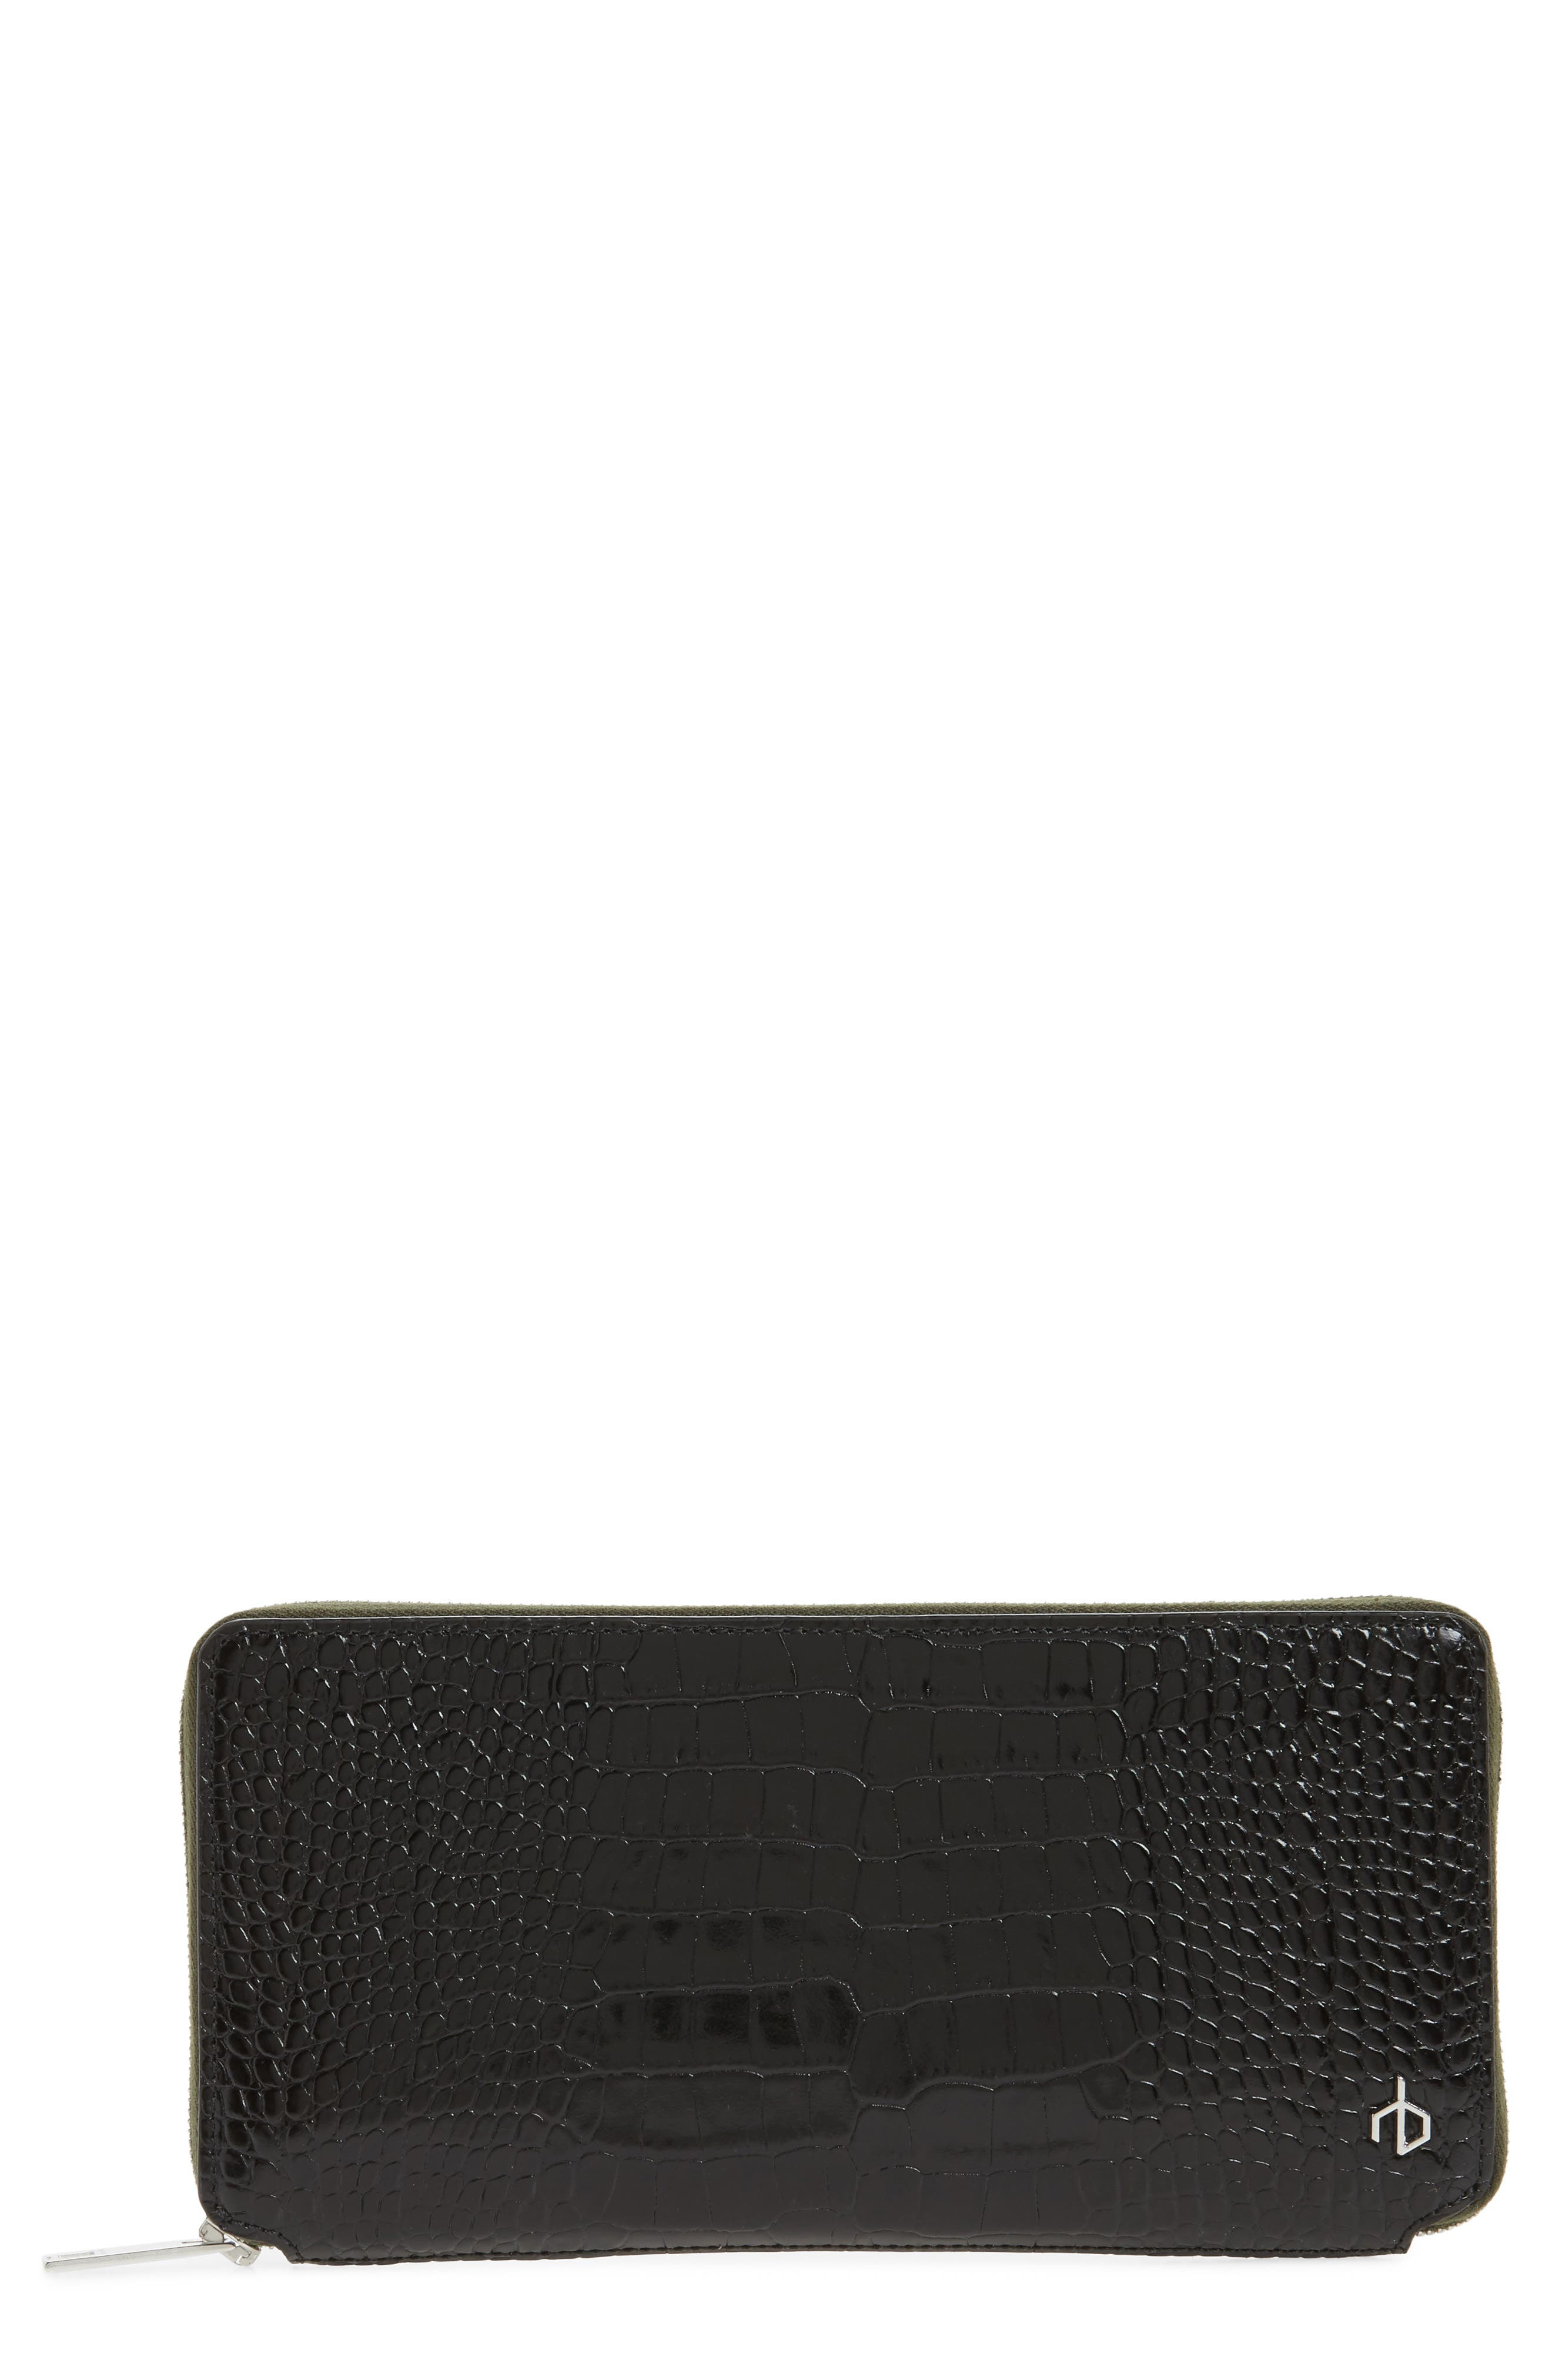 Croc Embossed Zip Around Leather Wallet,                         Main,                         color, Black Croco